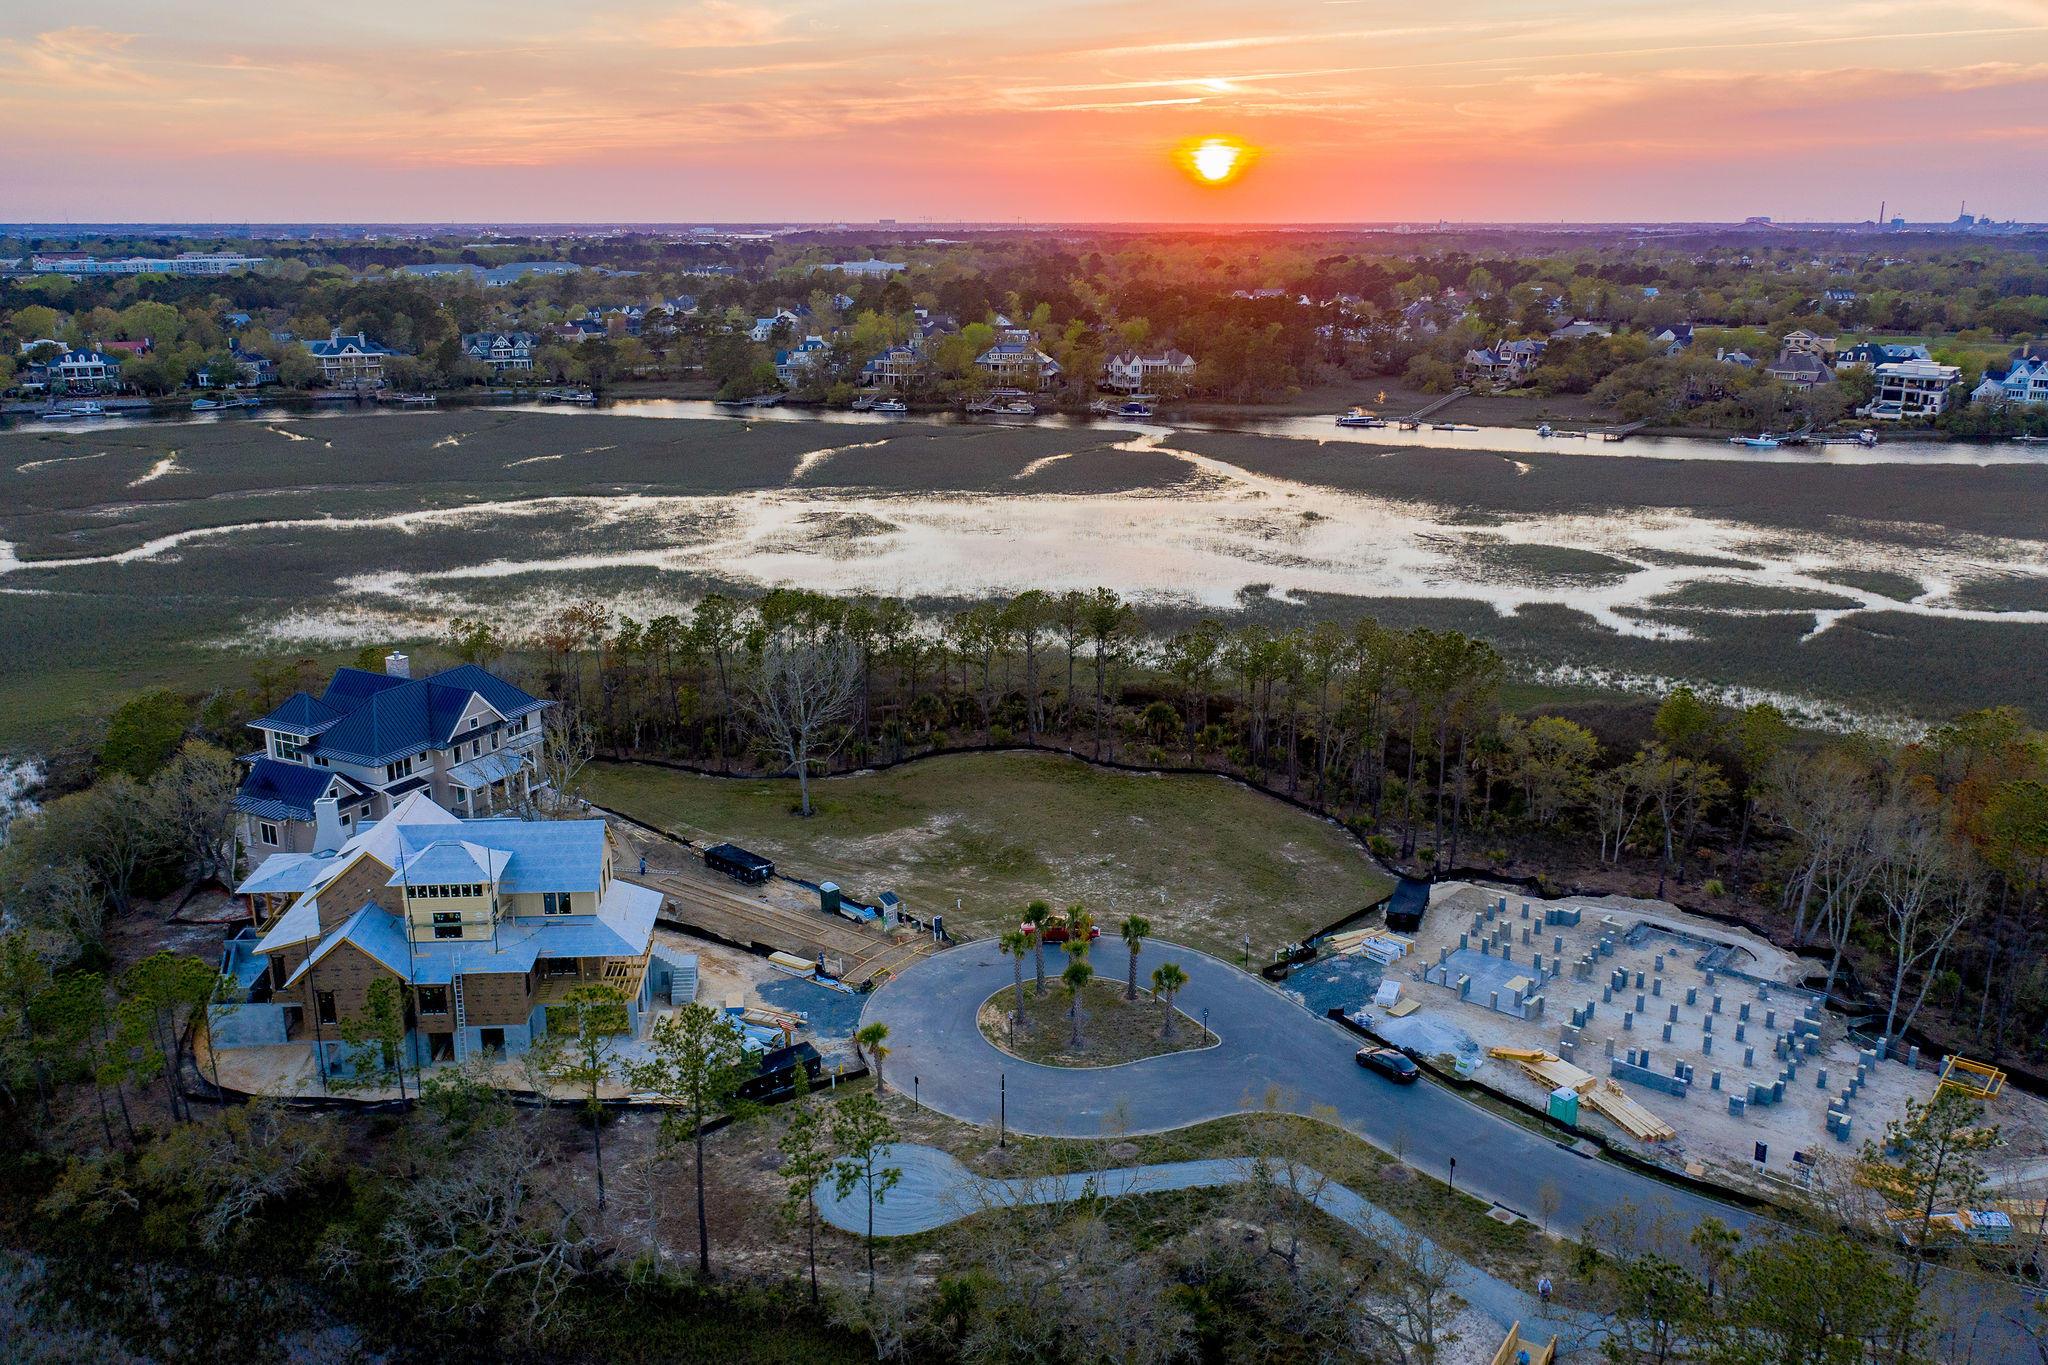 Daniel Island Park Homes For Sale - 113 Captains Island, Charleston, SC - 1